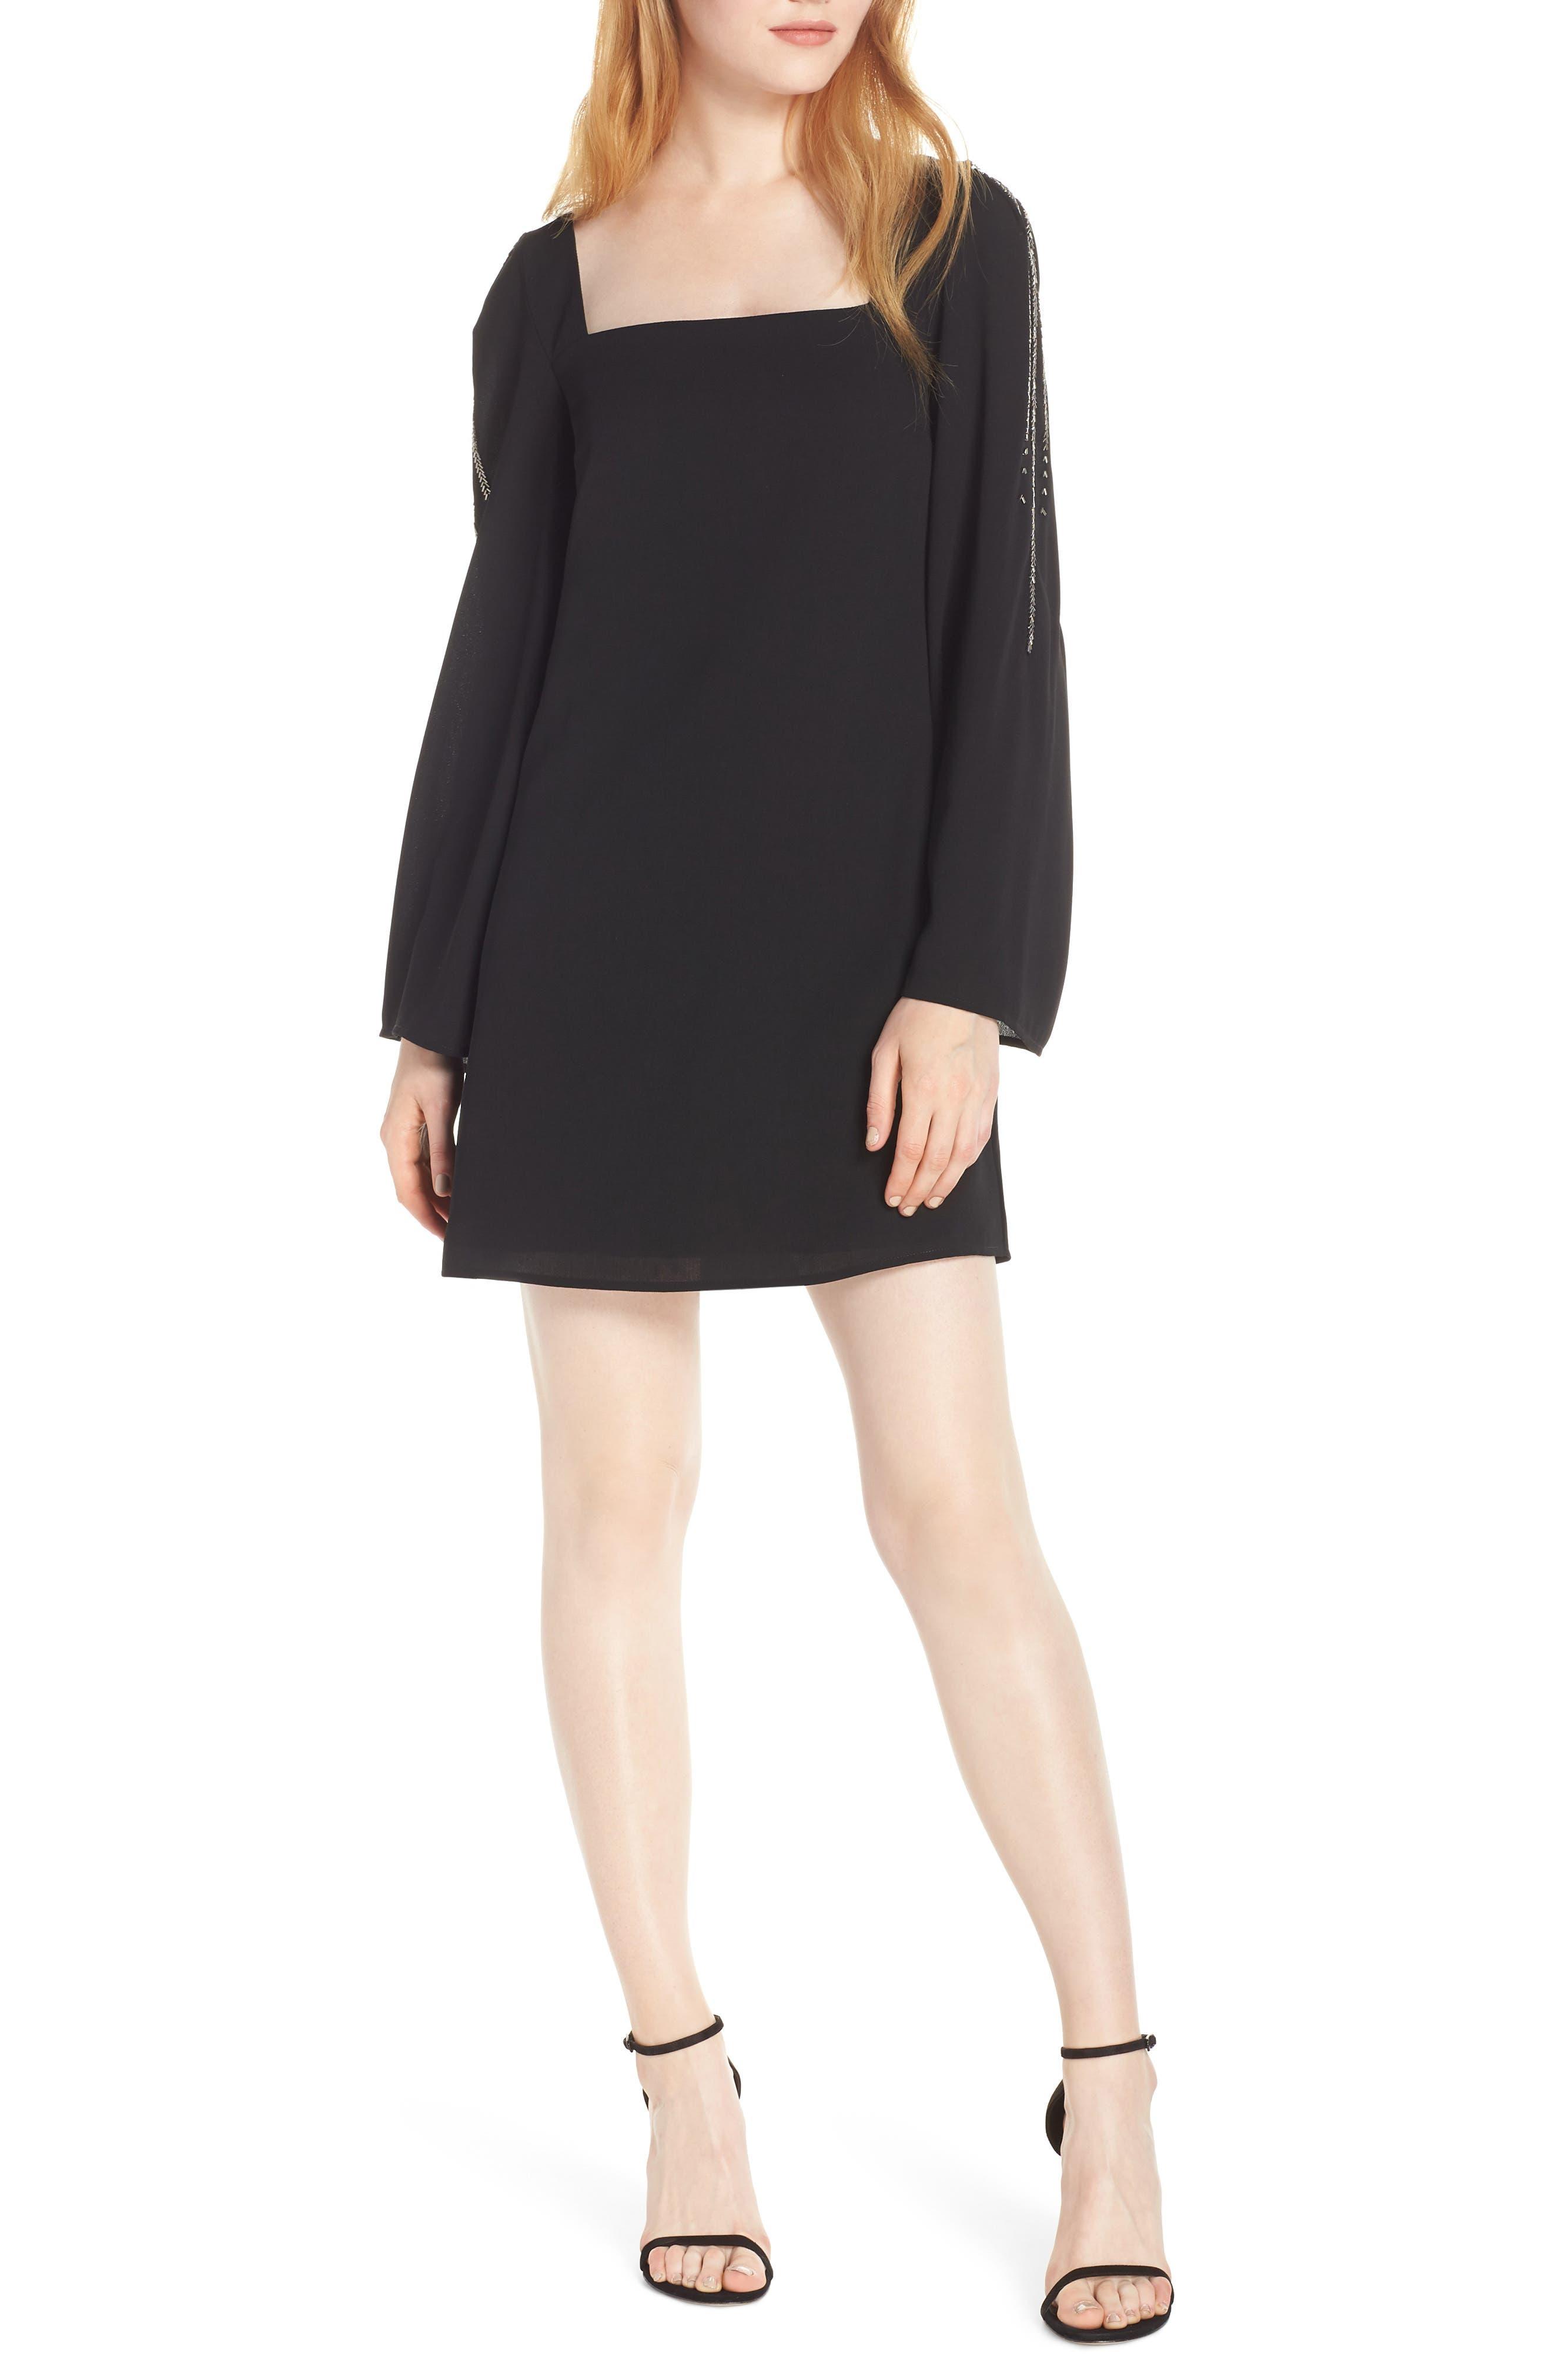 ALI & JAY On My Mind Minidress in Black